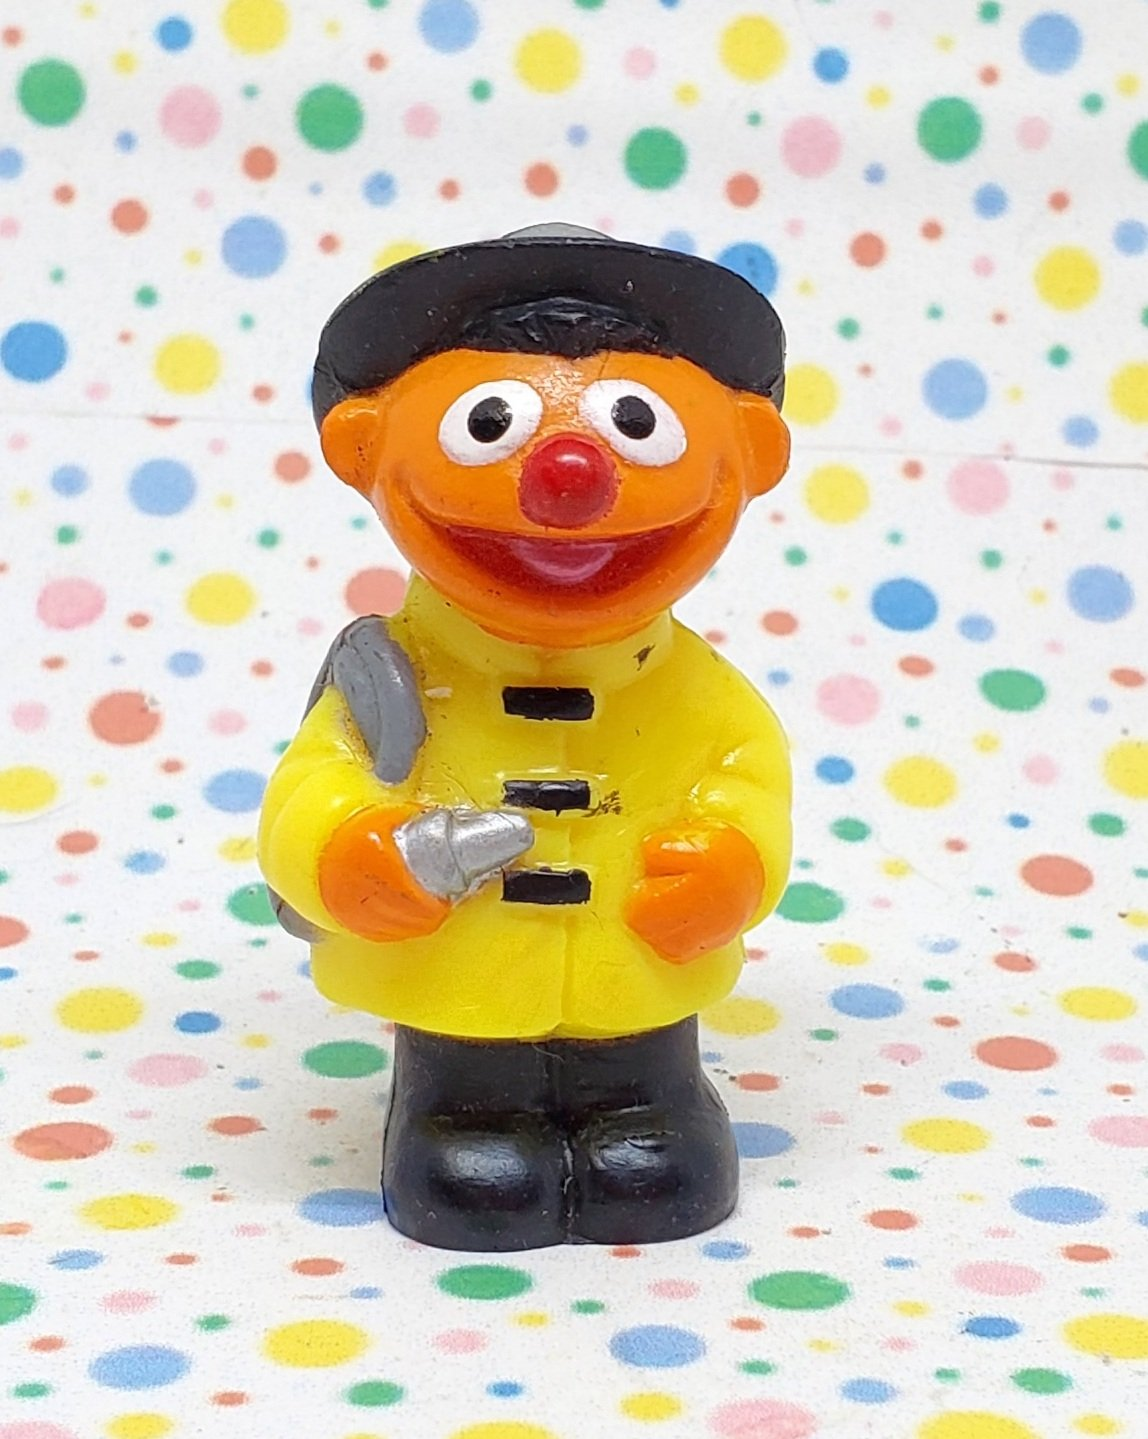 Vintage Sesame Street Ernie Firefighter Figure